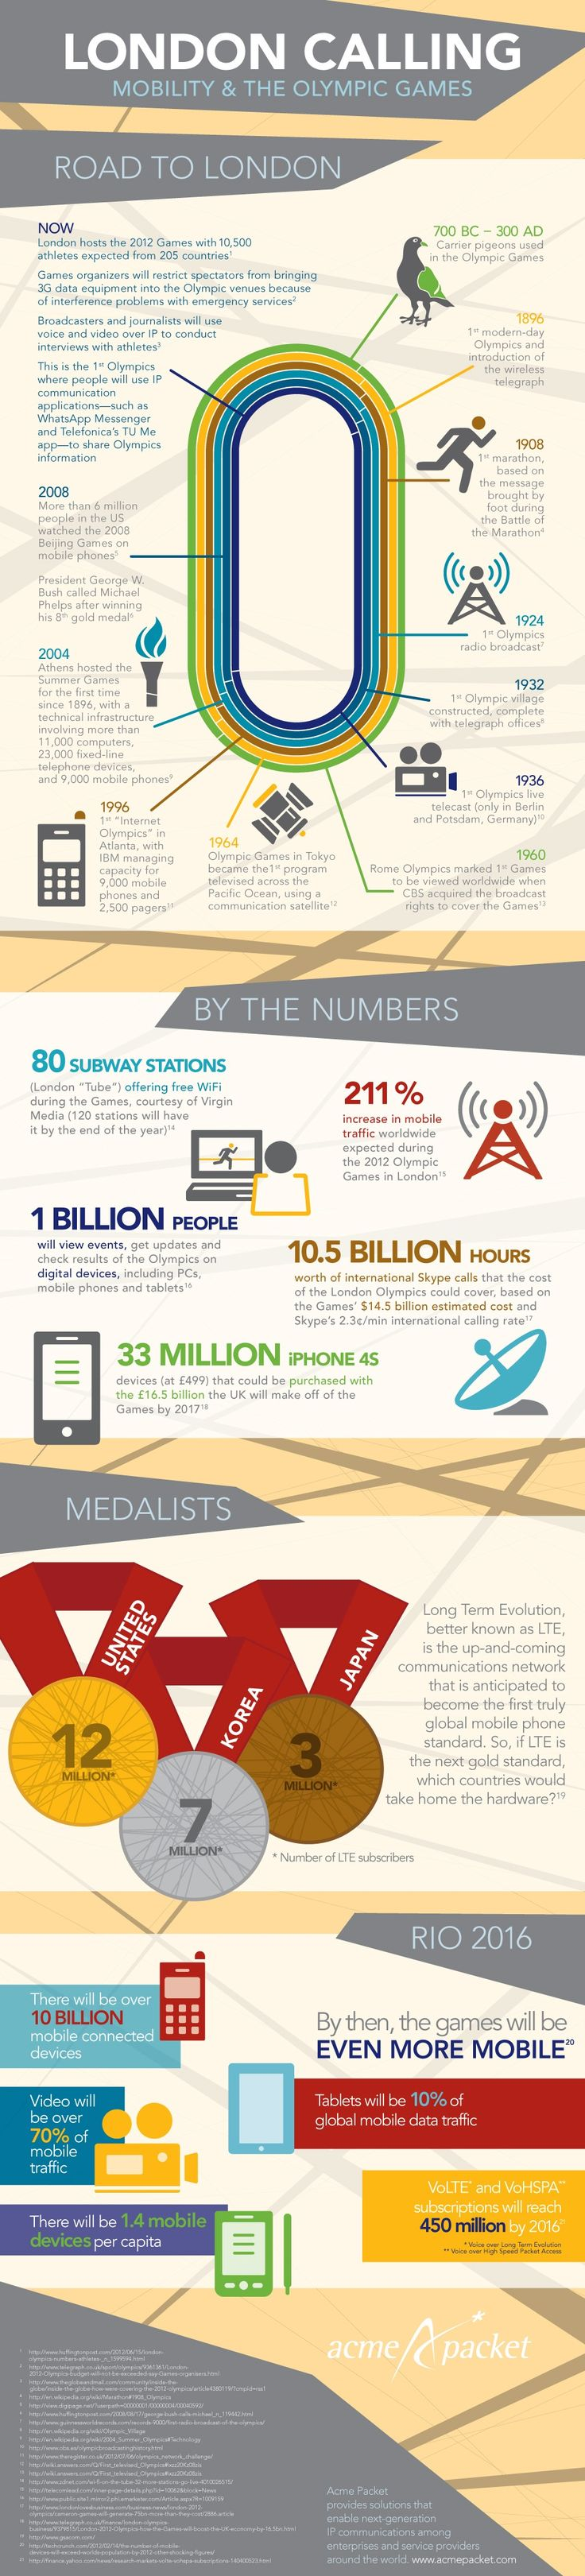 apkt_londoncalling_infographic_press